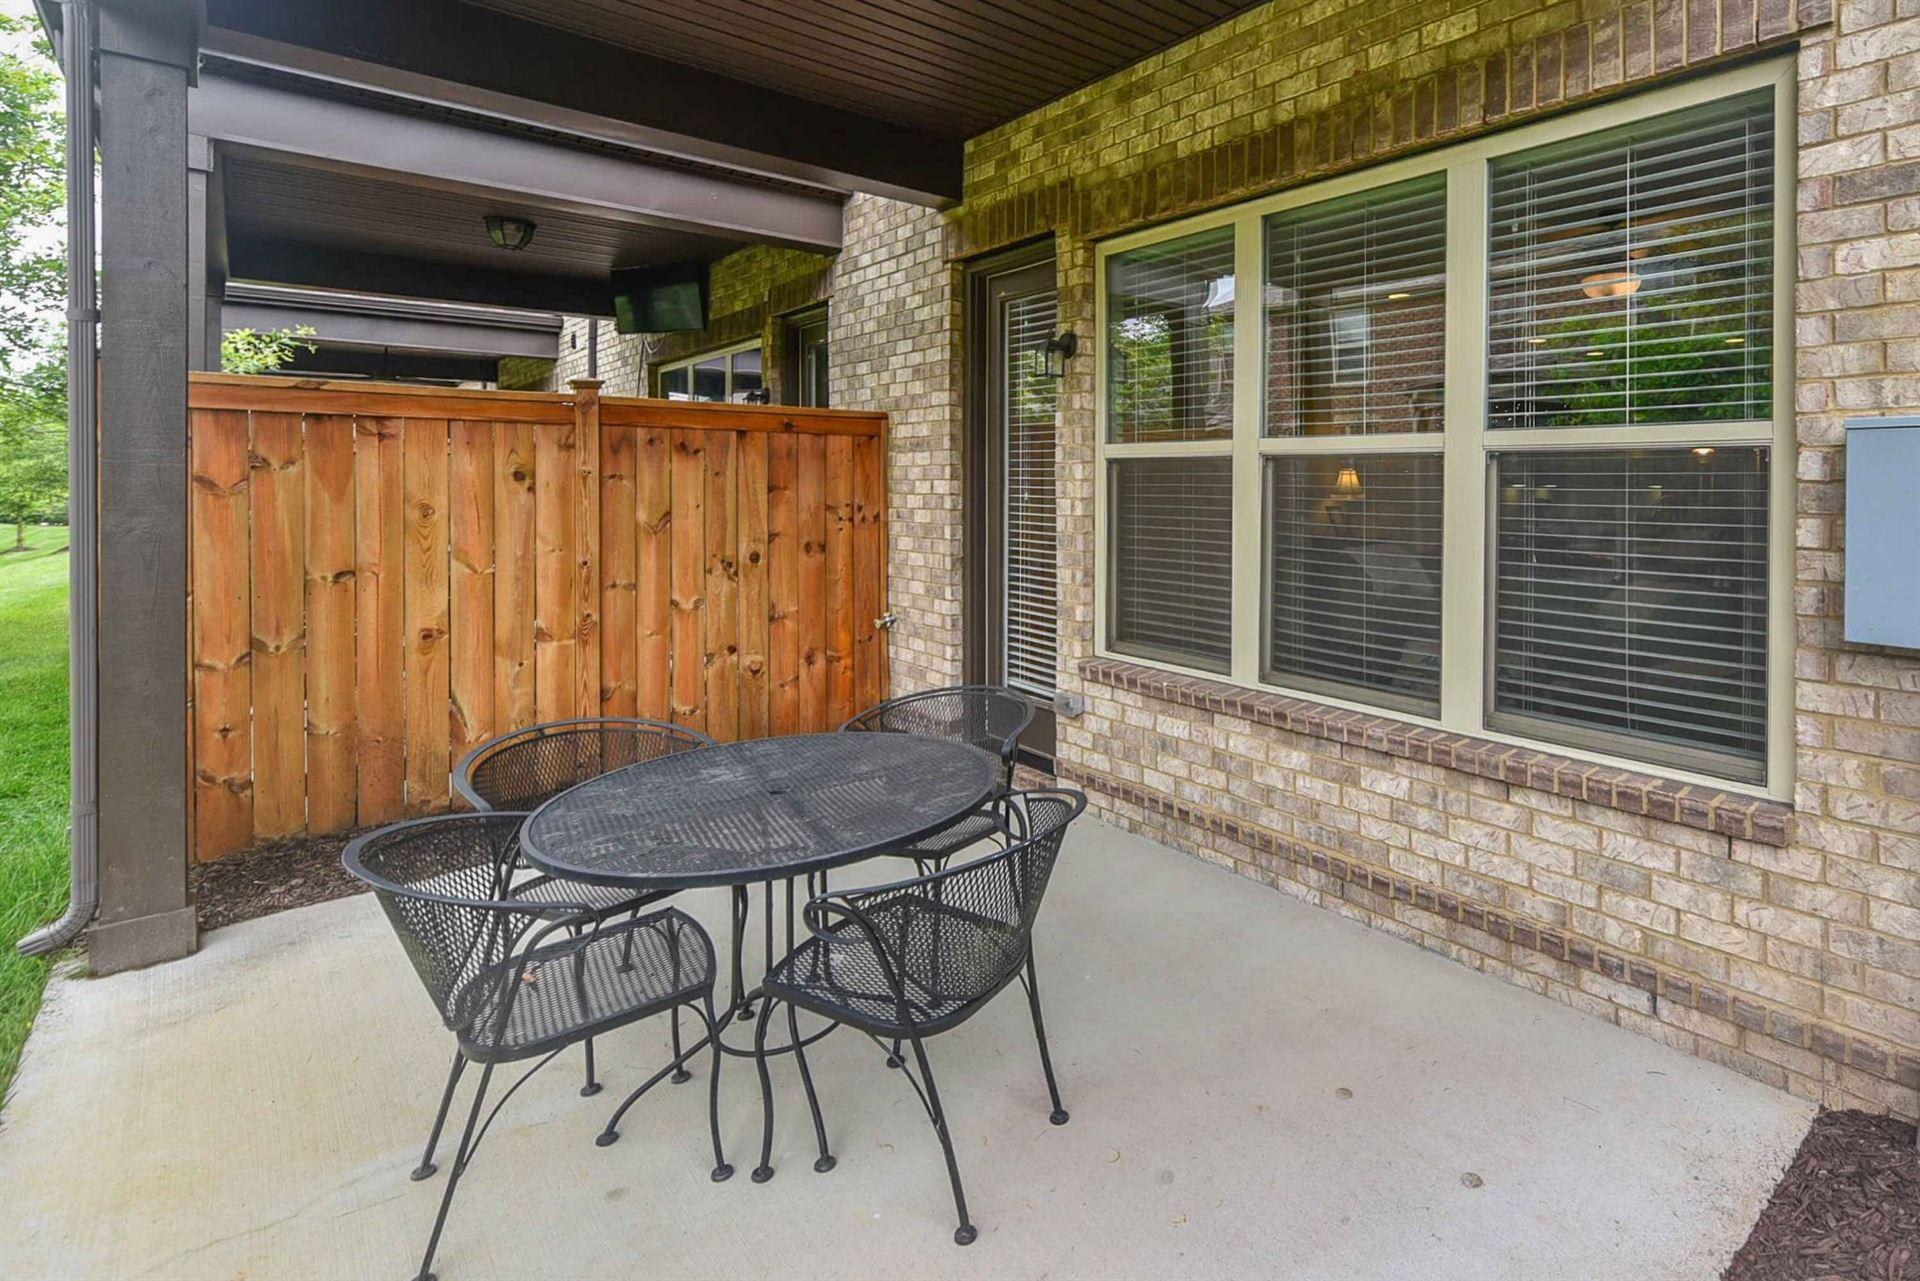 Photo of 348 Coronado Circle Pvt, Hendersonville, TN 37075 (MLS # 2262327)